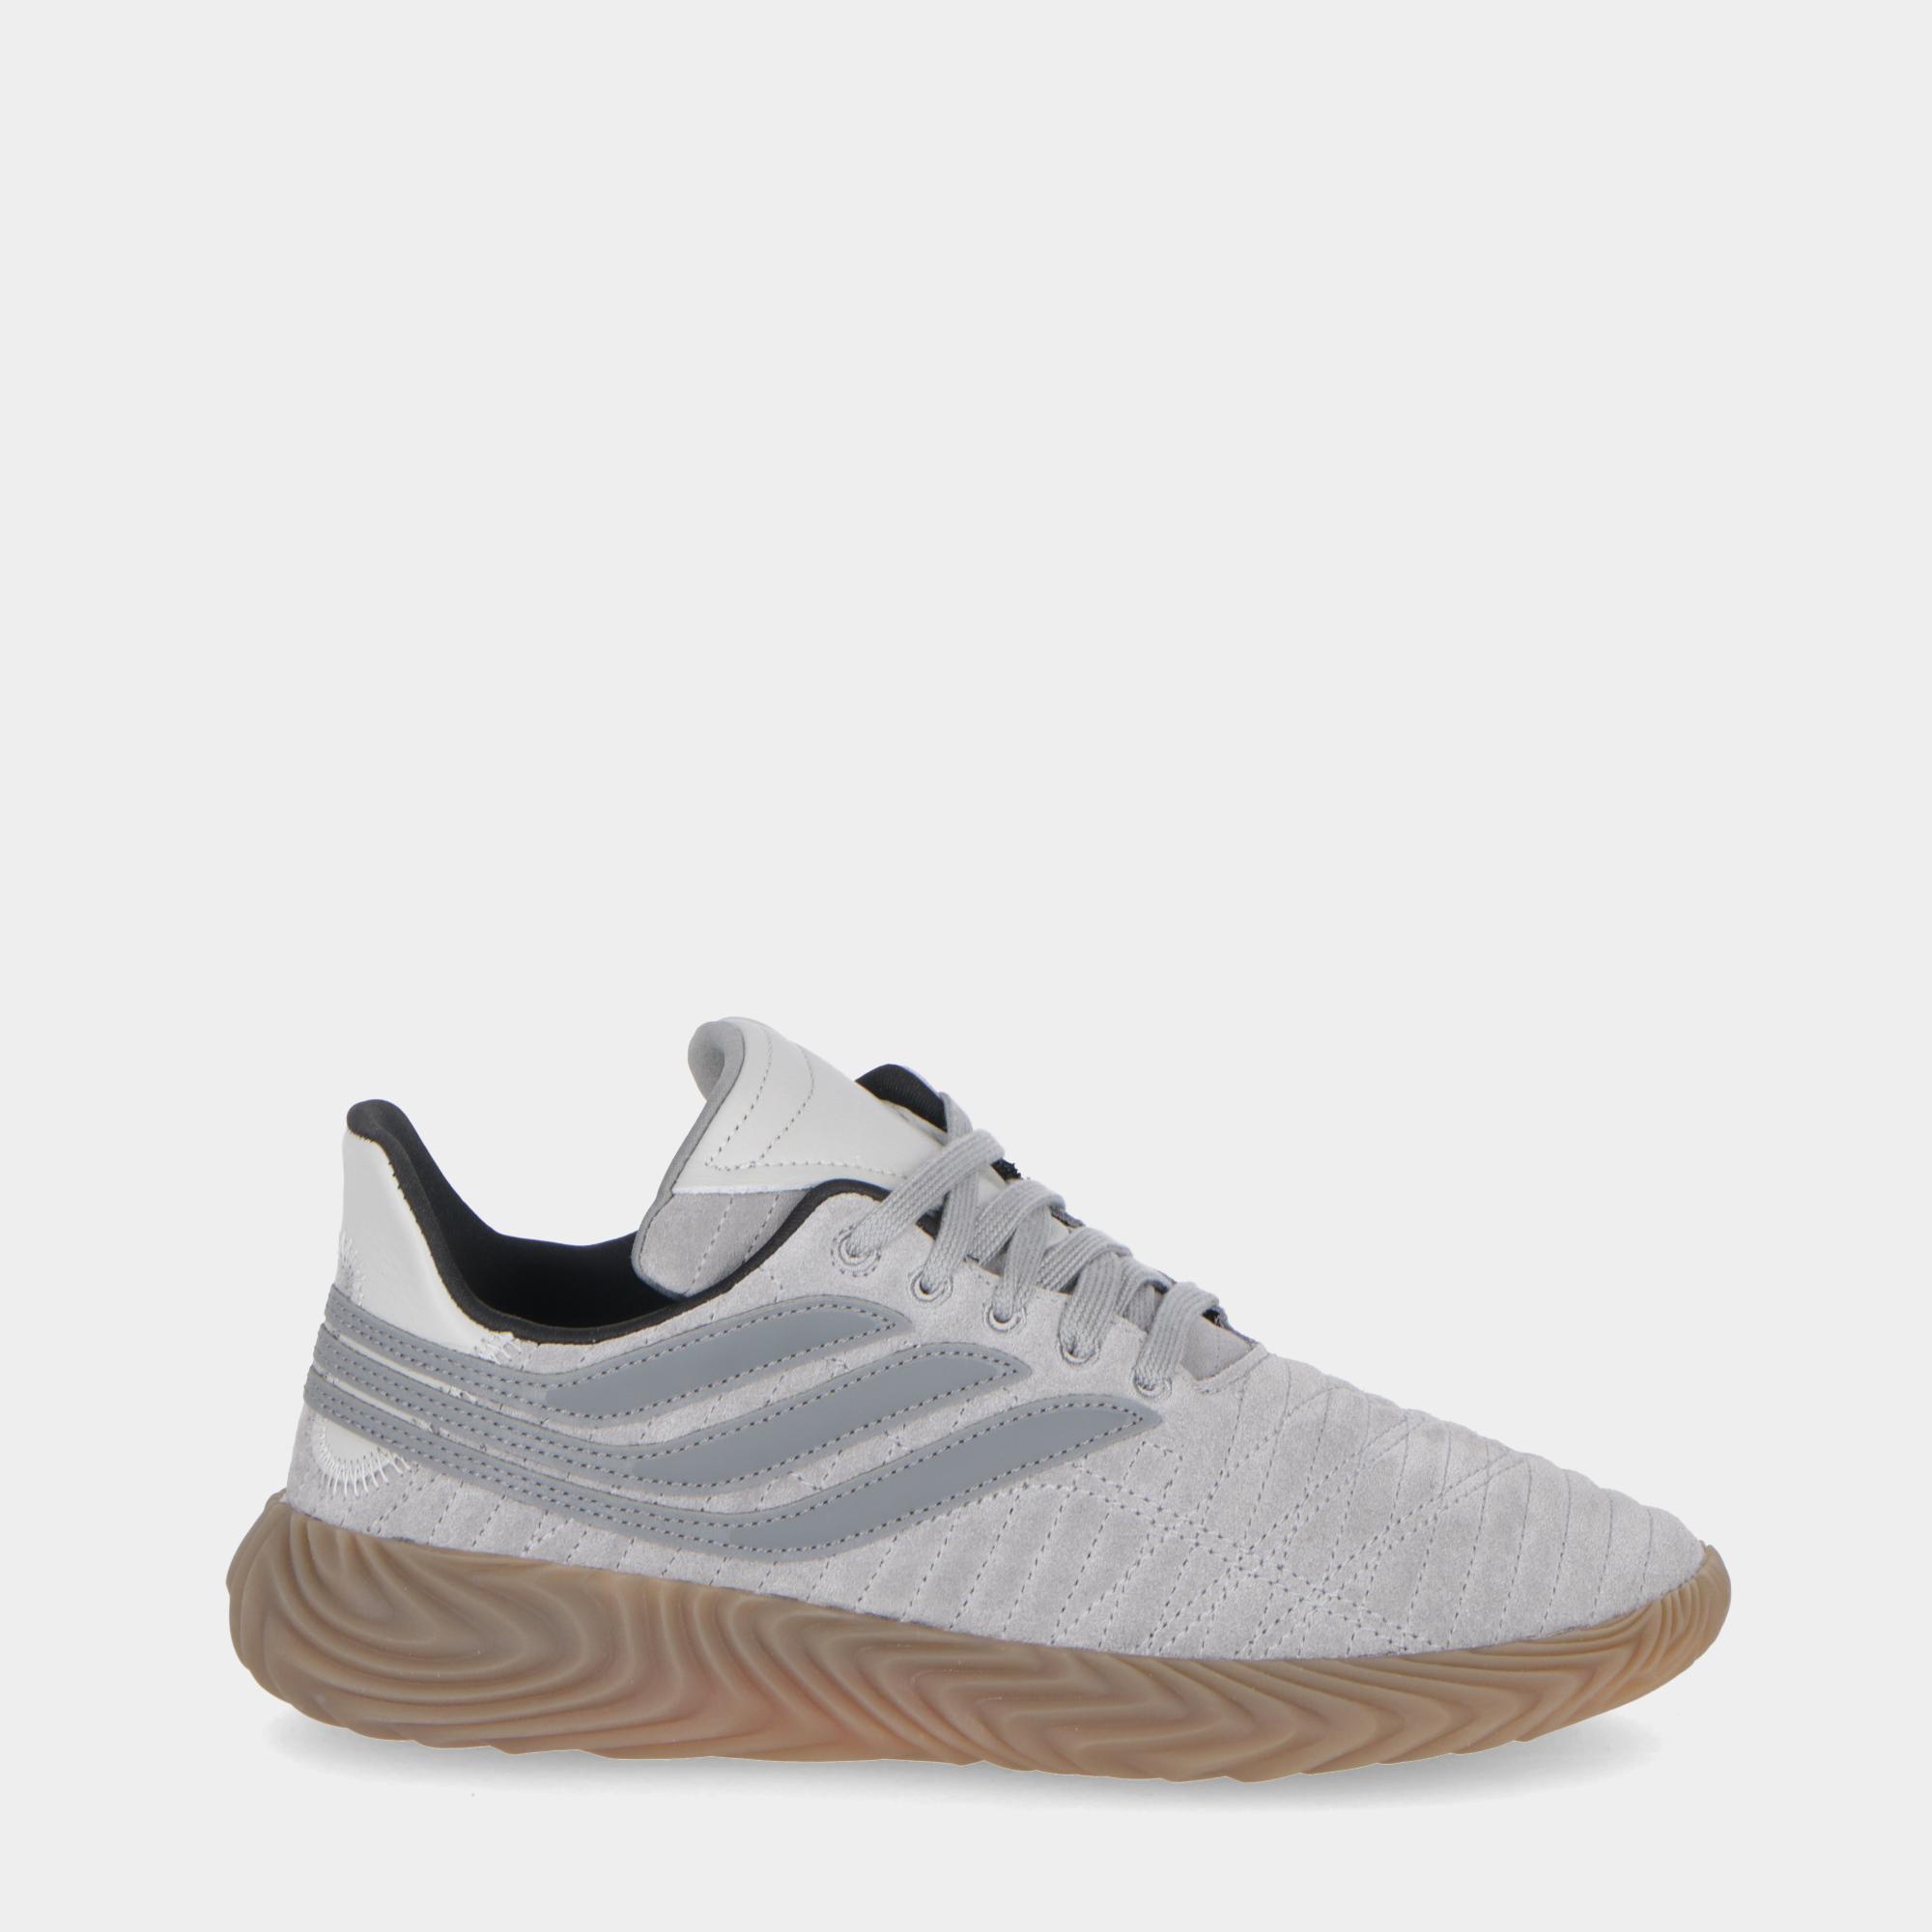 Adidas Sobakov GREY GREY GREY ce8013dfd